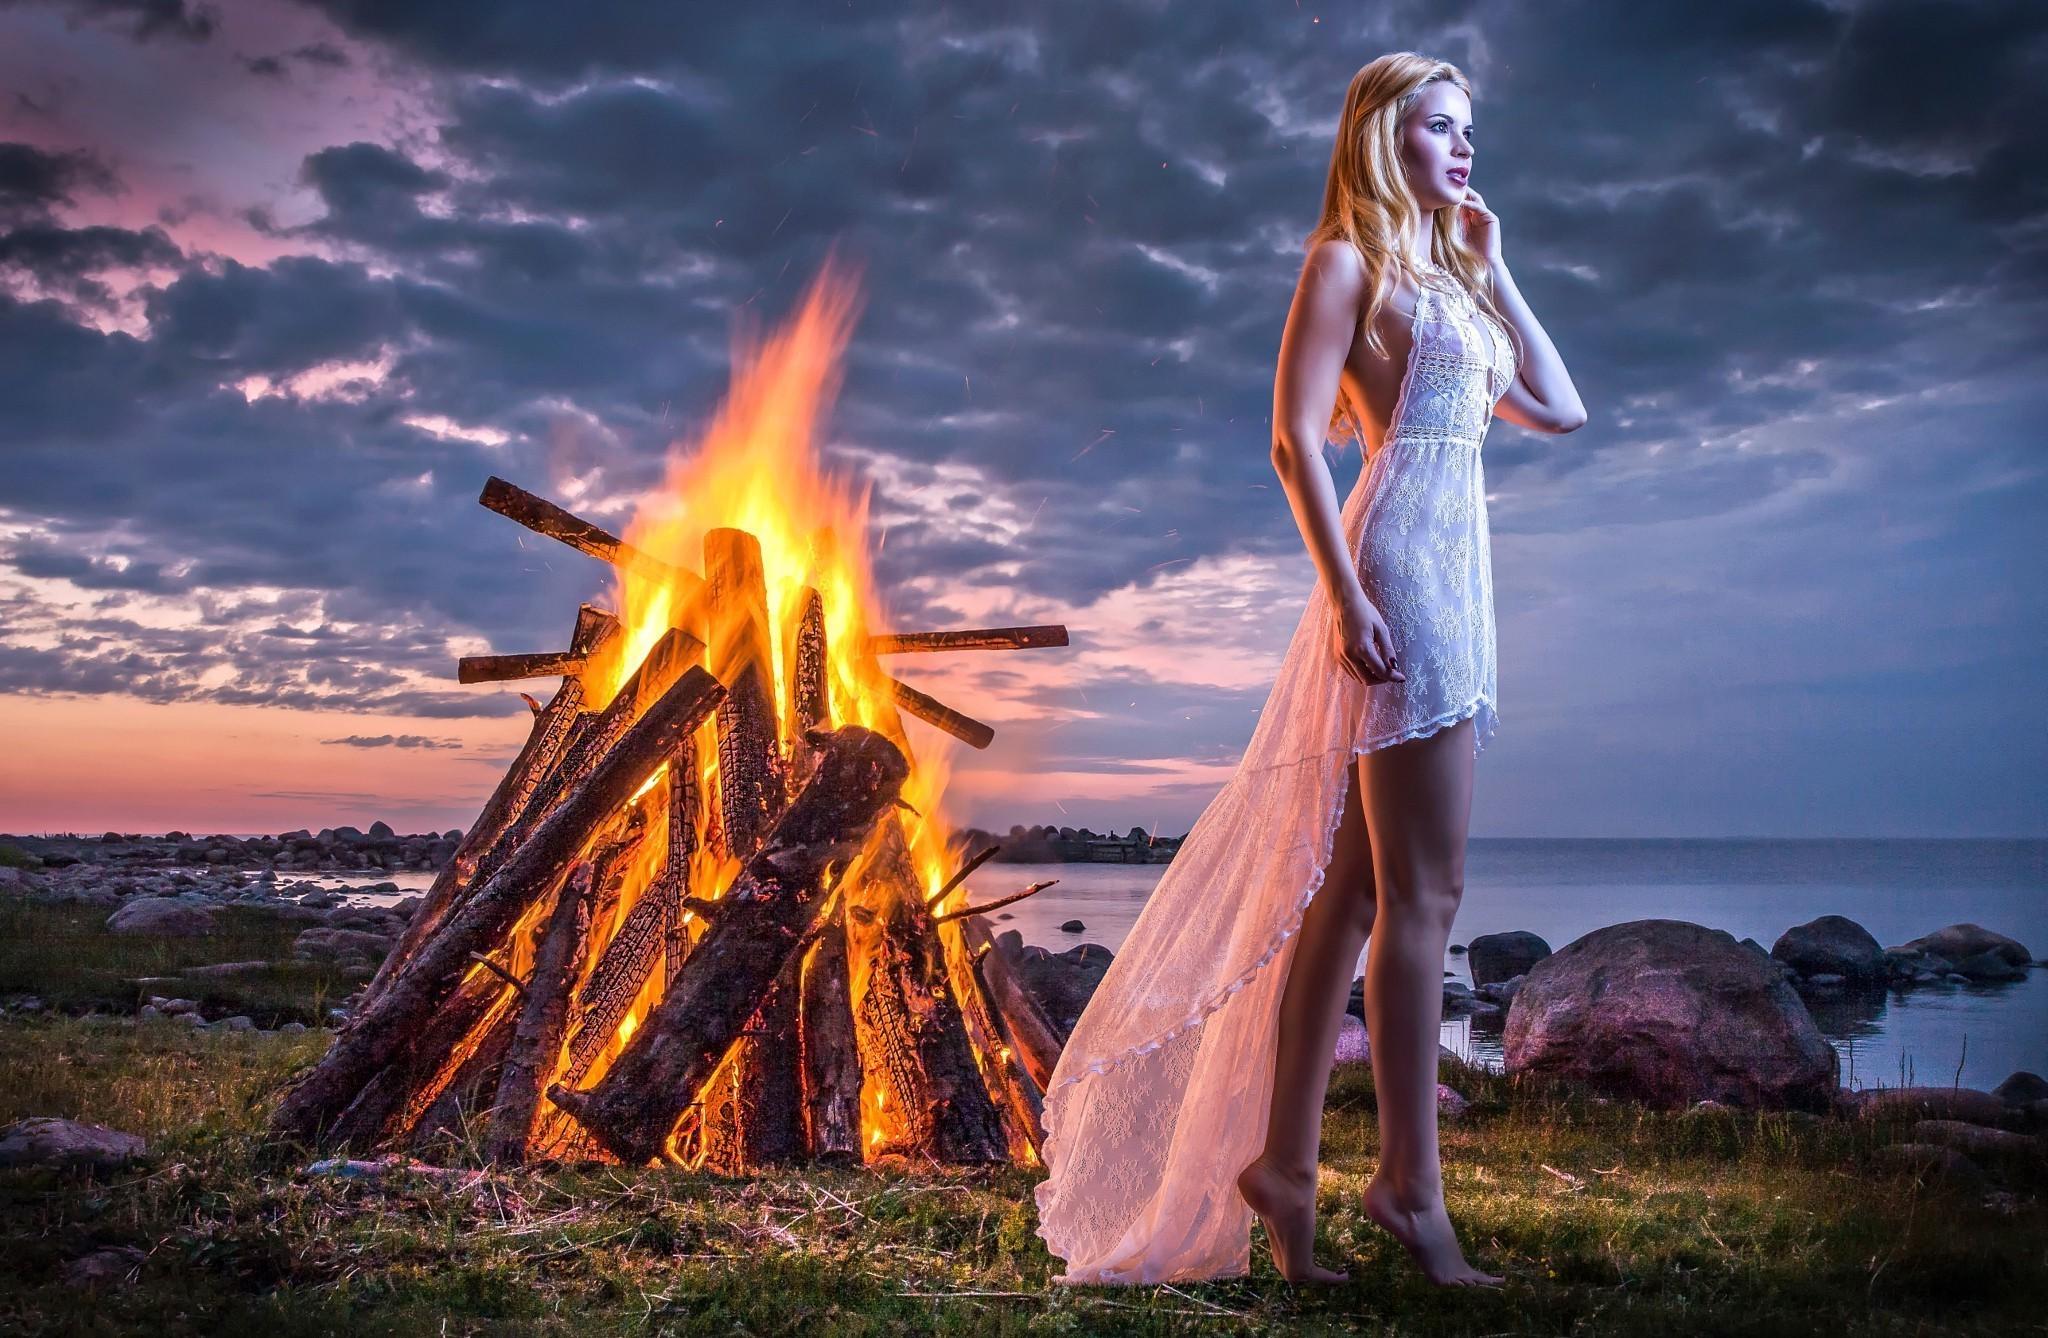 Sad Girl Standing Alone Wallpapers Alone Girl Standing Near Fire Hd Girls 4k Wallpapers